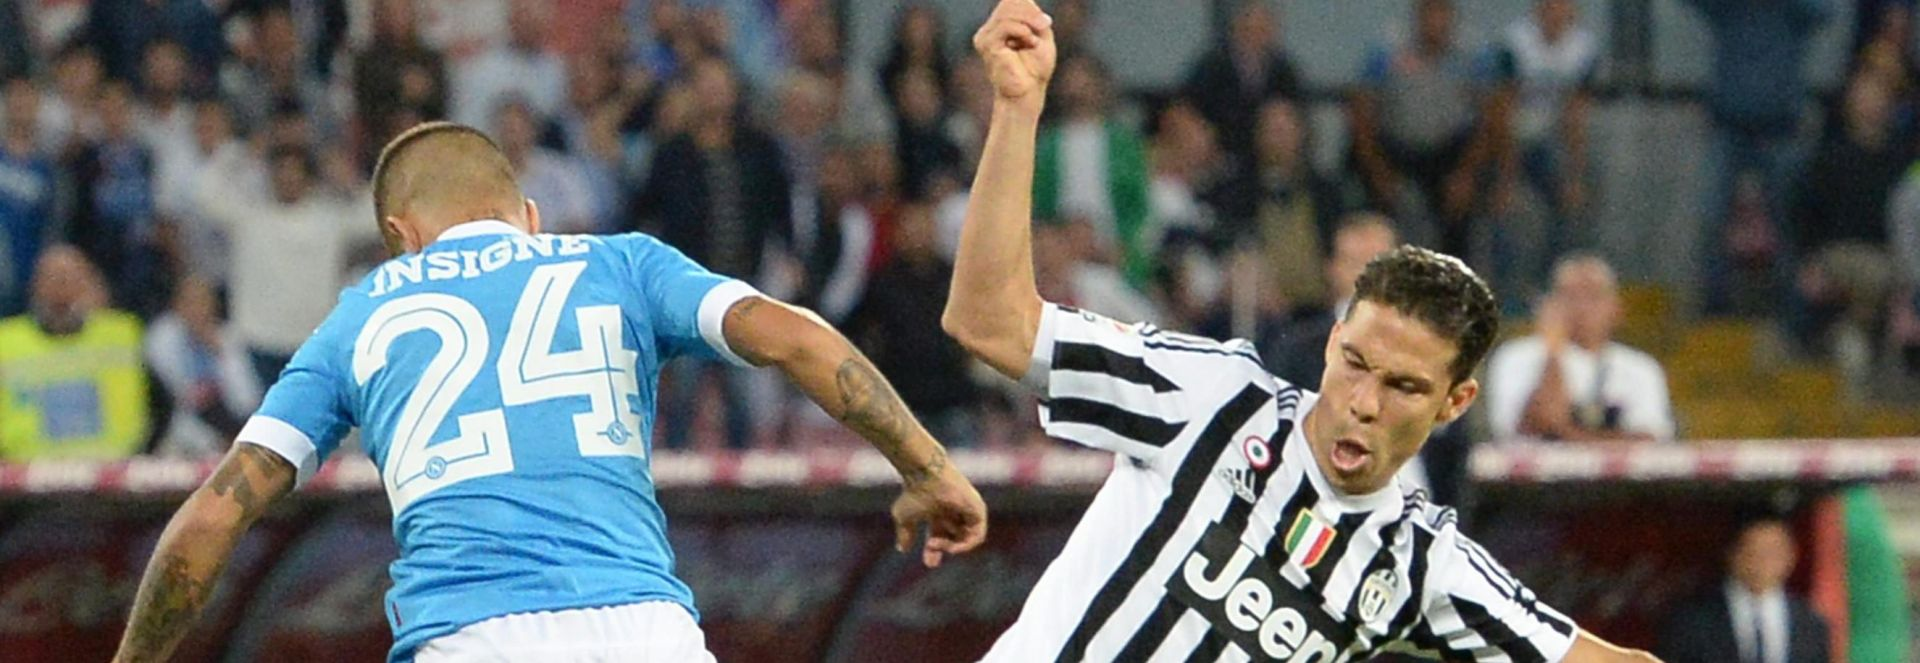 NIKAD GORE U 45 GODINA Trener Mandžukićevog Juventusa Allegri na rubu otkaza